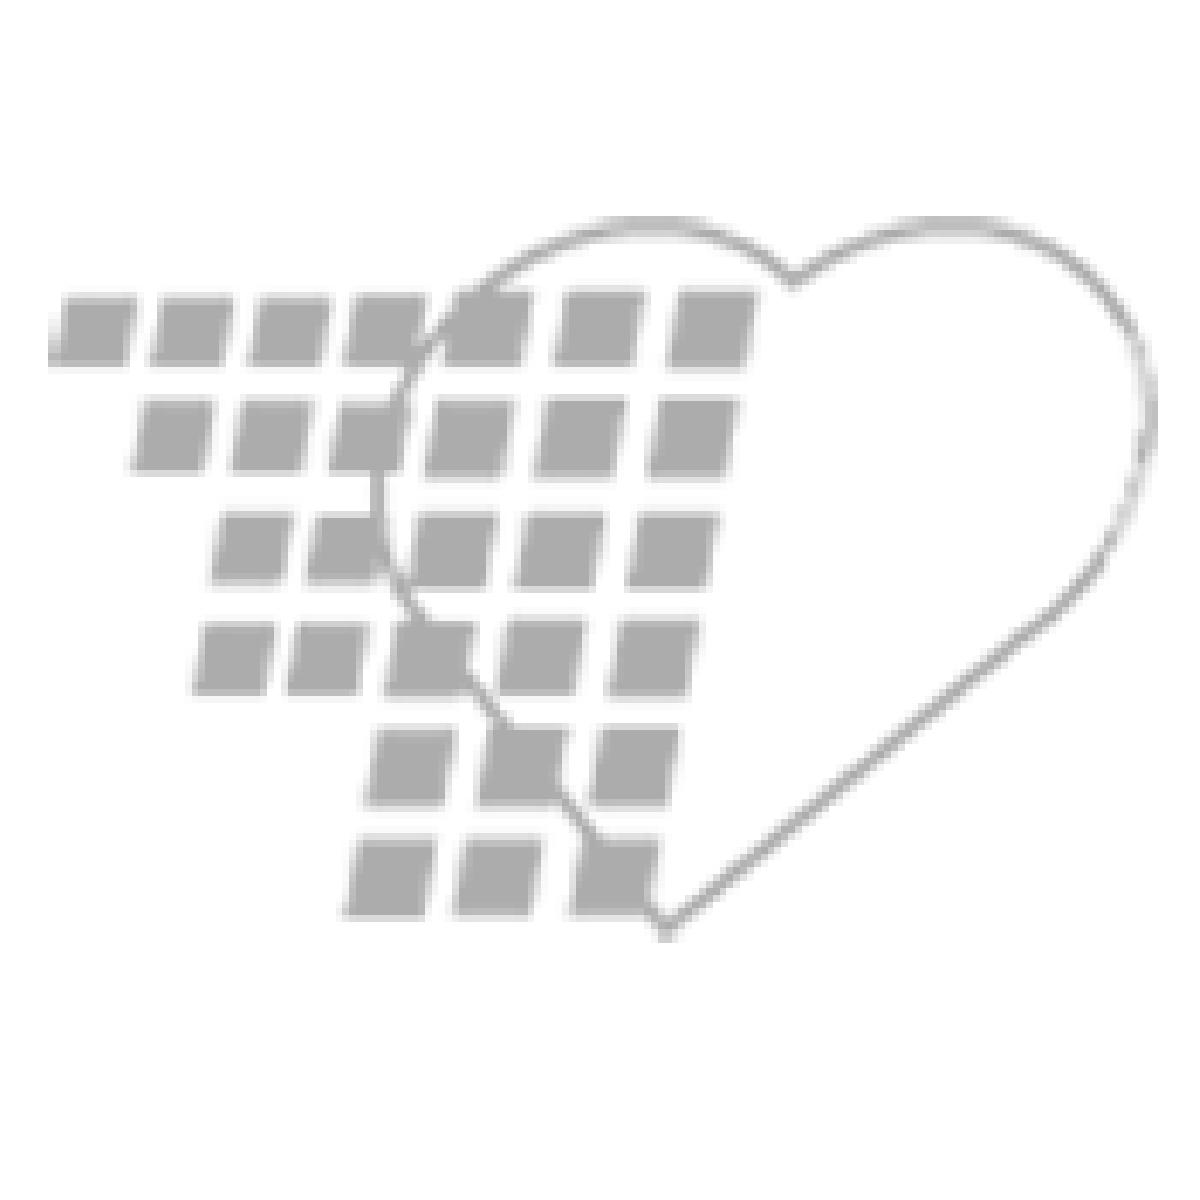 02-99-4501 ADC® Replacement Laryngoscope Lamp